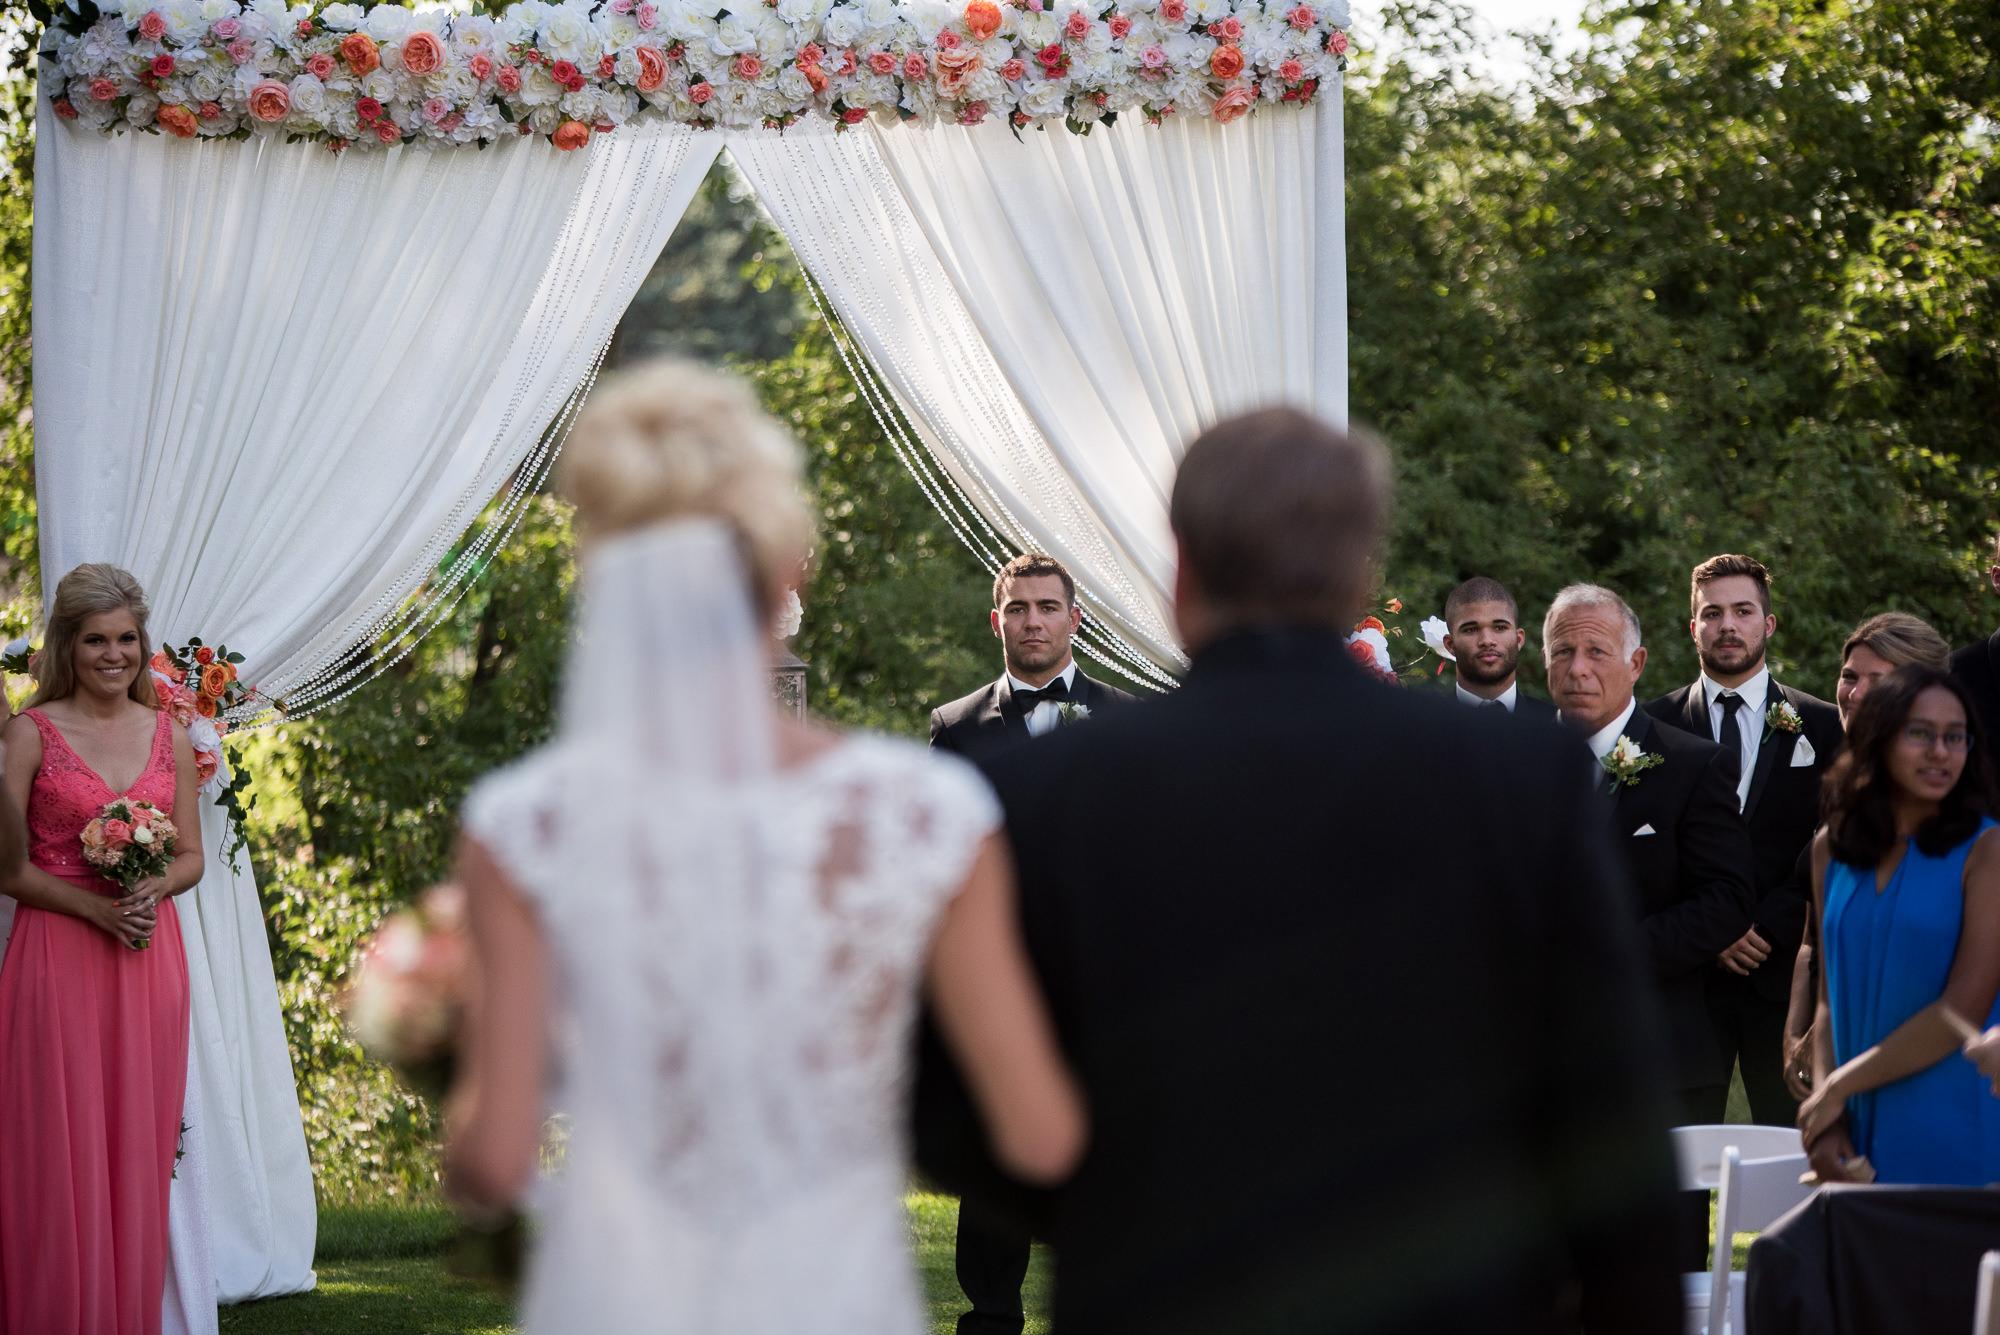 DAKOTA-DUNES-WEDDING-SOUTH-DAKOTA-WEDDING-PHOTOGRAPHER-0015.jpg